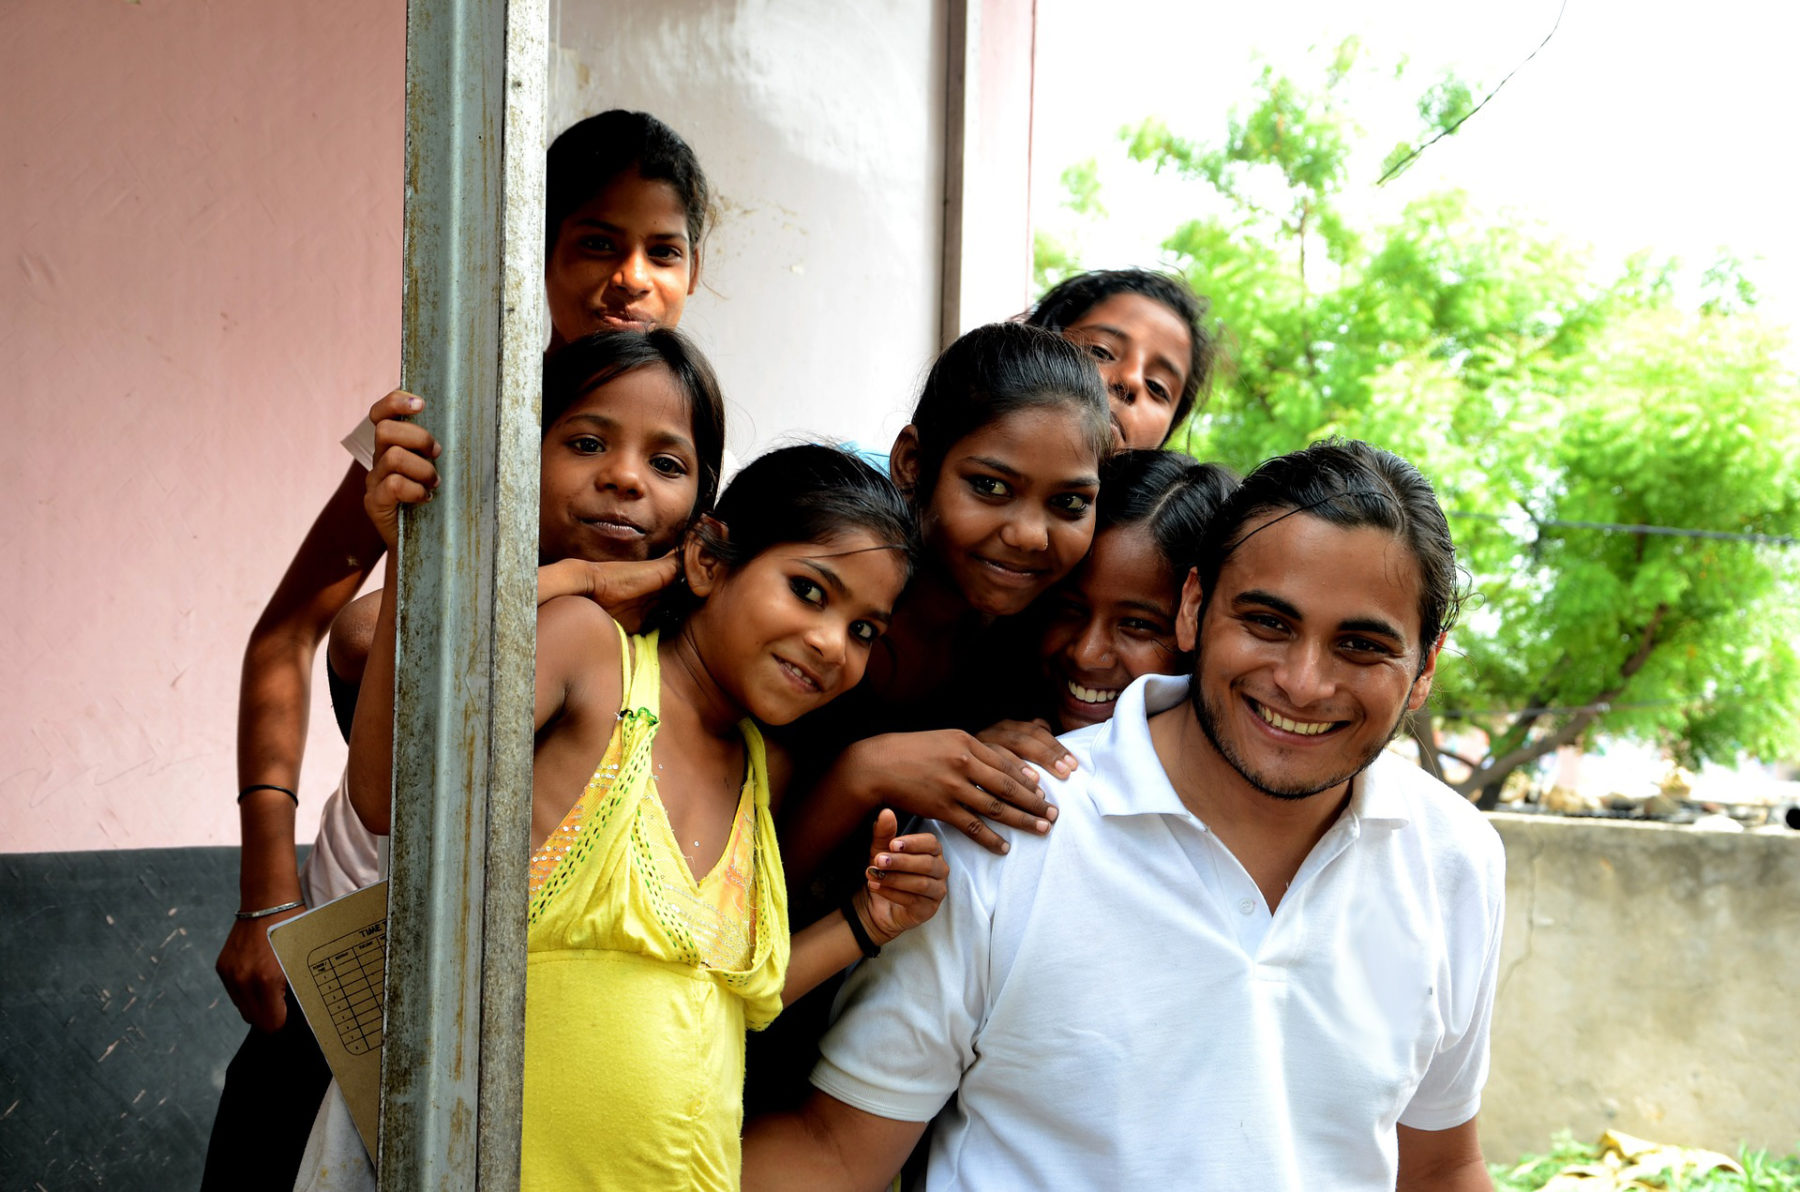 Volontariat international humanitaire